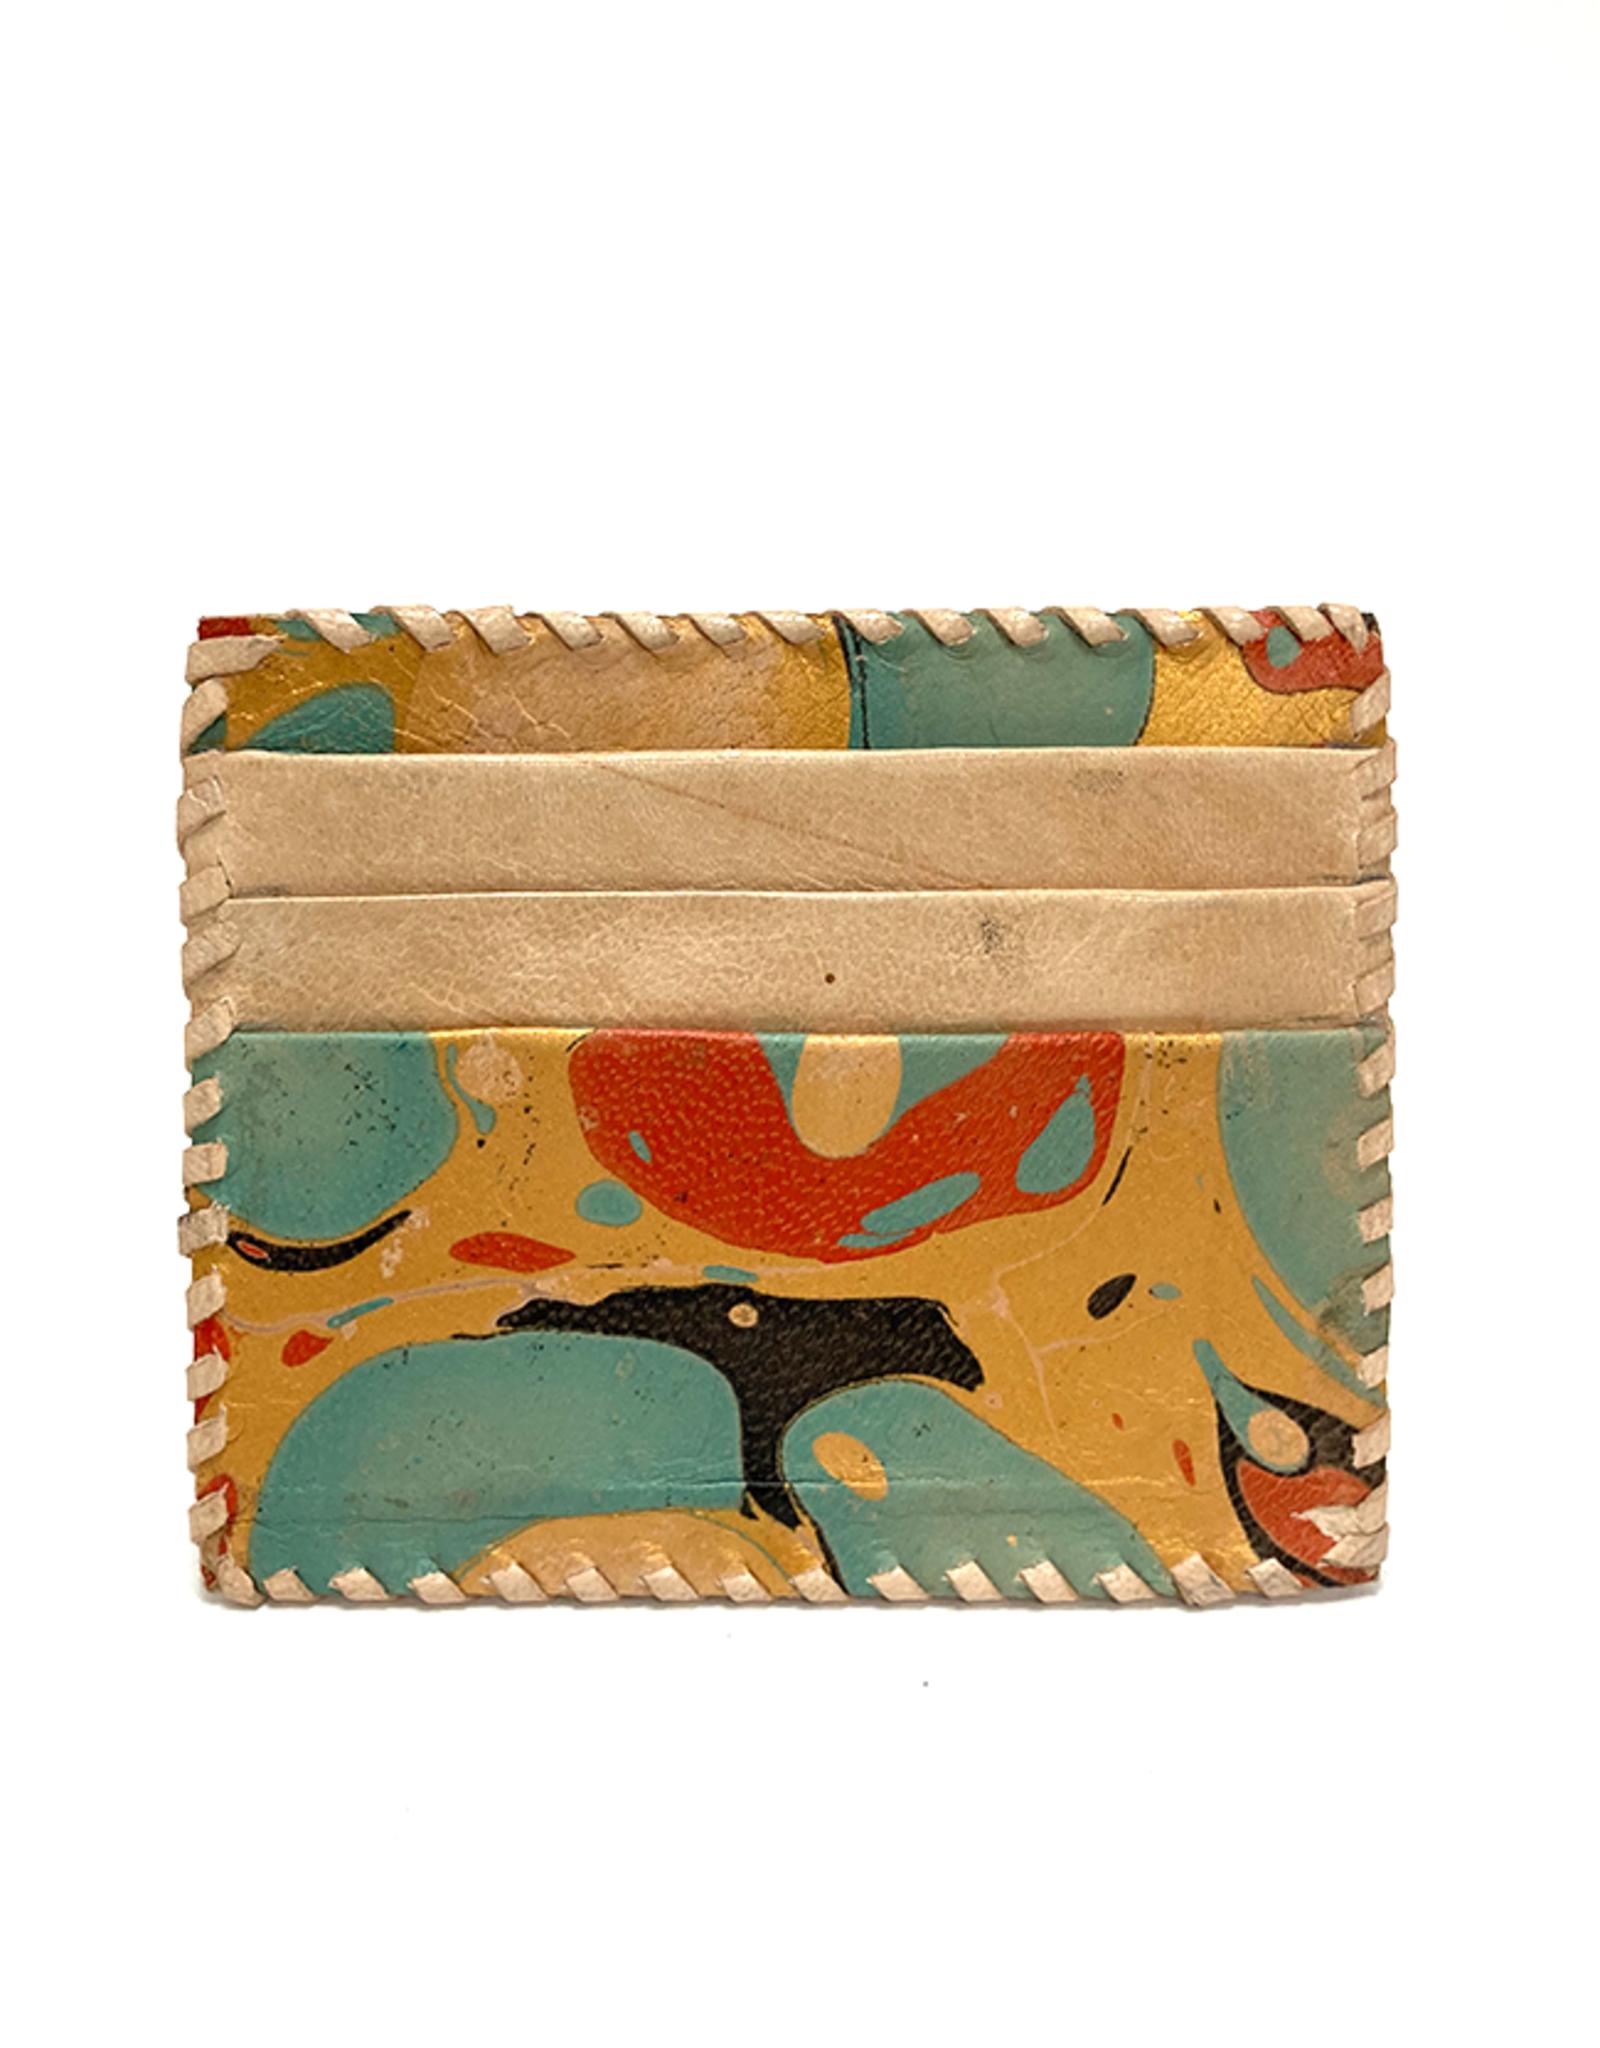 Gold Aqua Marbled Leather Card Holder